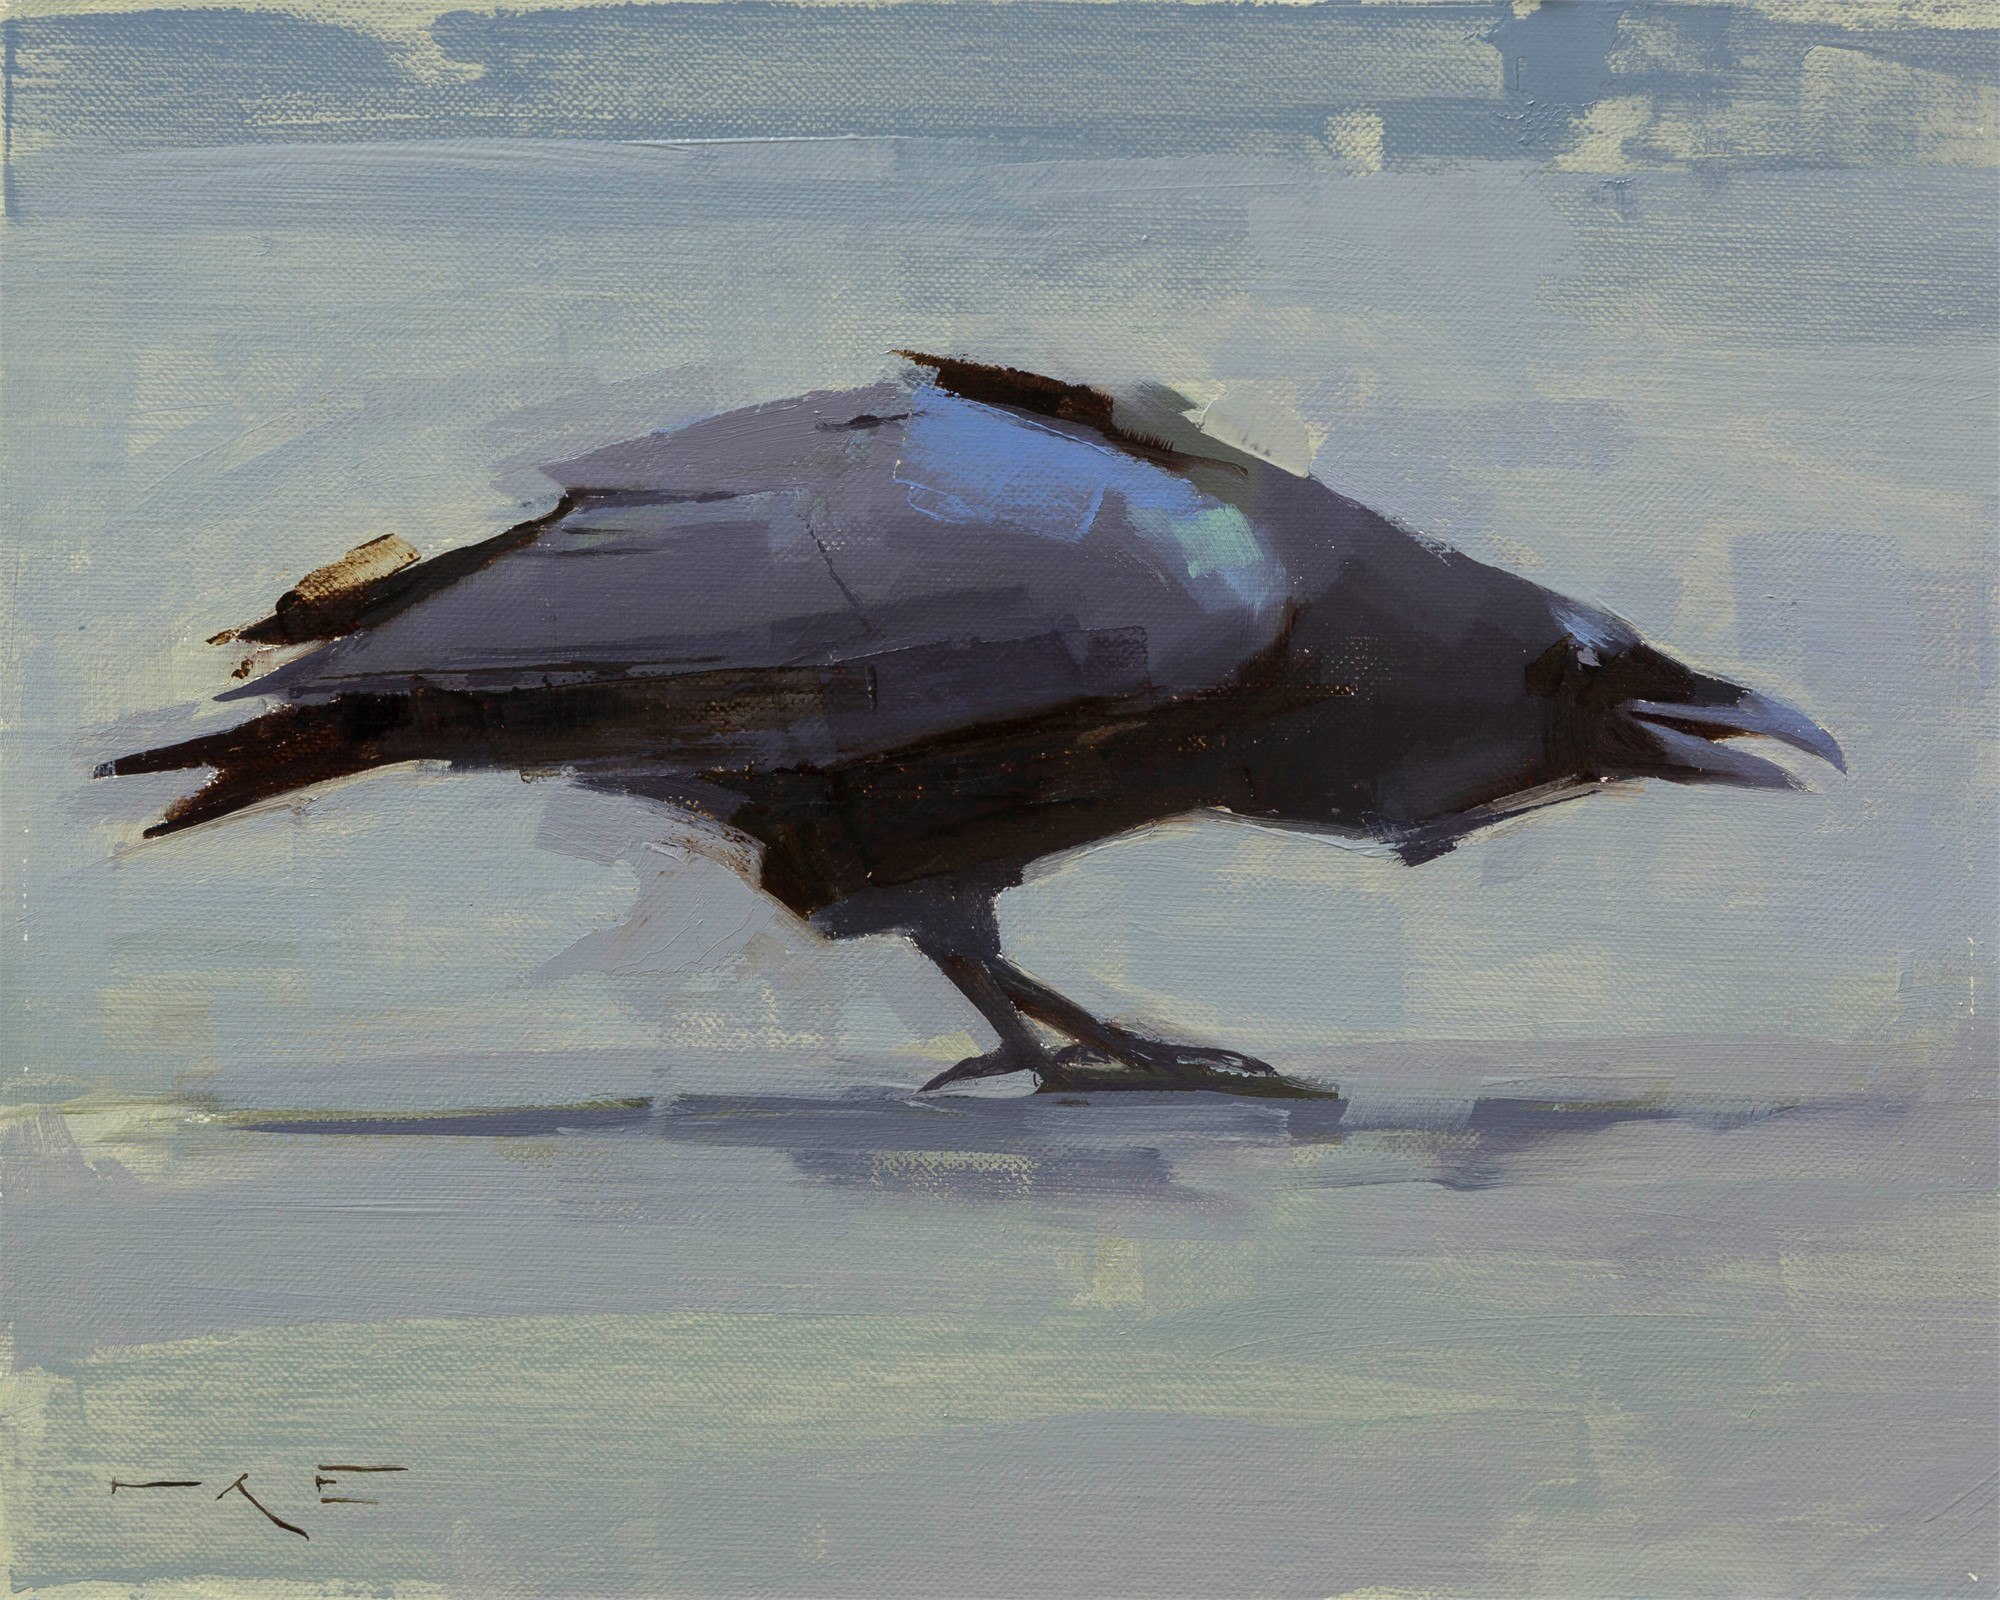 Raven I by Thorgrimur Einarsson